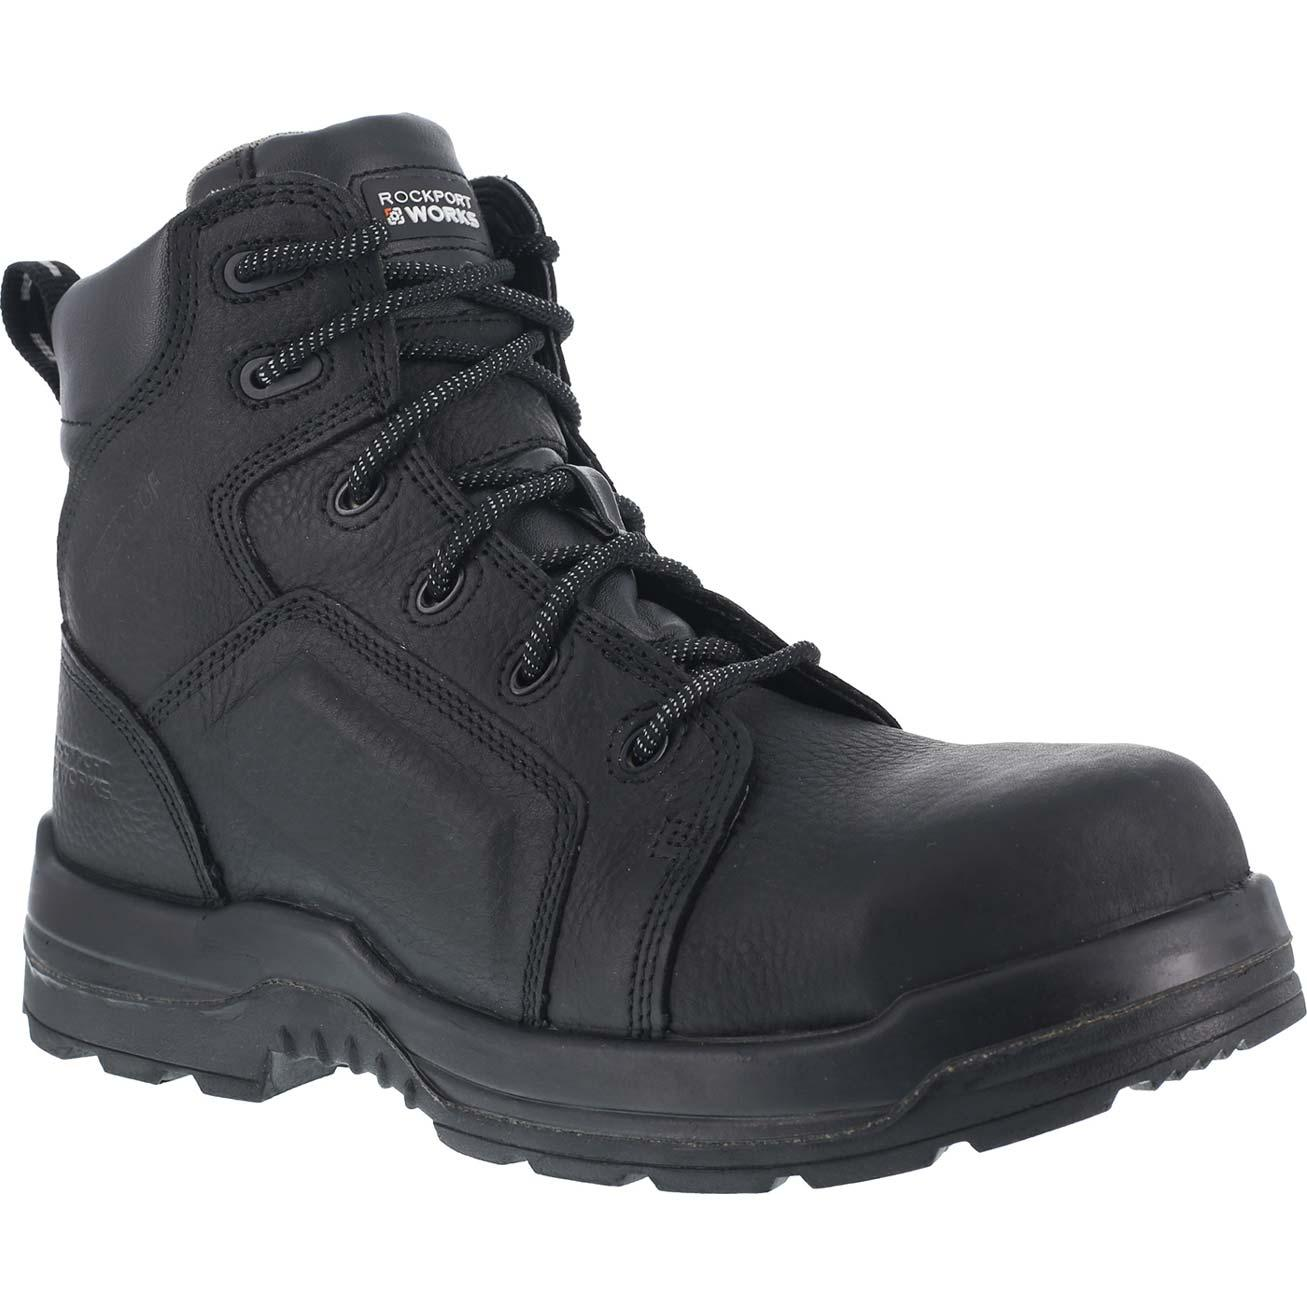 f1c231a40b4 Rockport Composite Toe Waterproof Non-Metallic Work Boot  RK6635